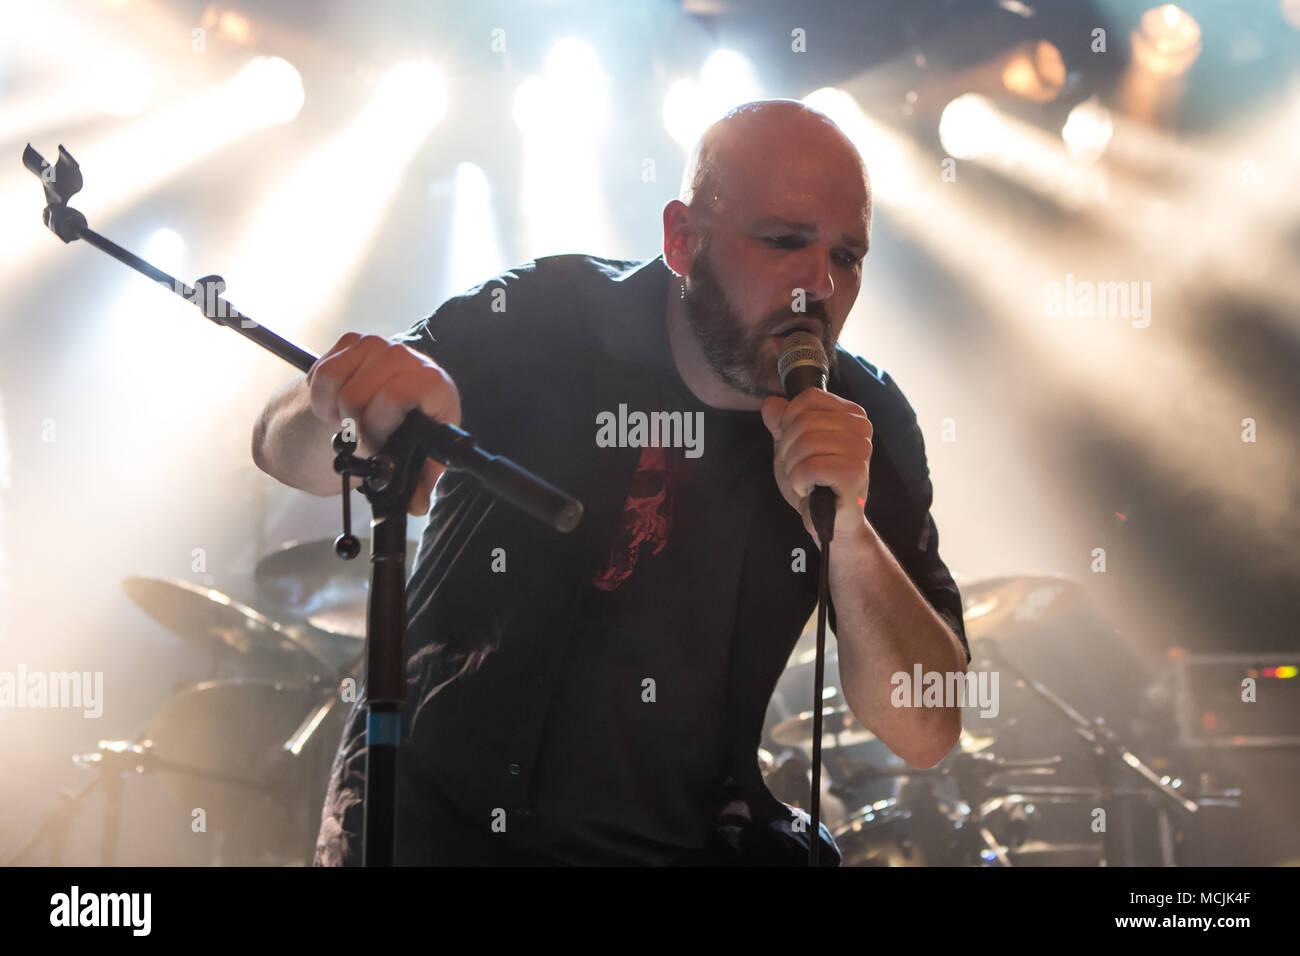 Andre Ellenberger singer of the Swiss metal band Piranha live in the Schüür Lucerne, Switzerland Stock Photo